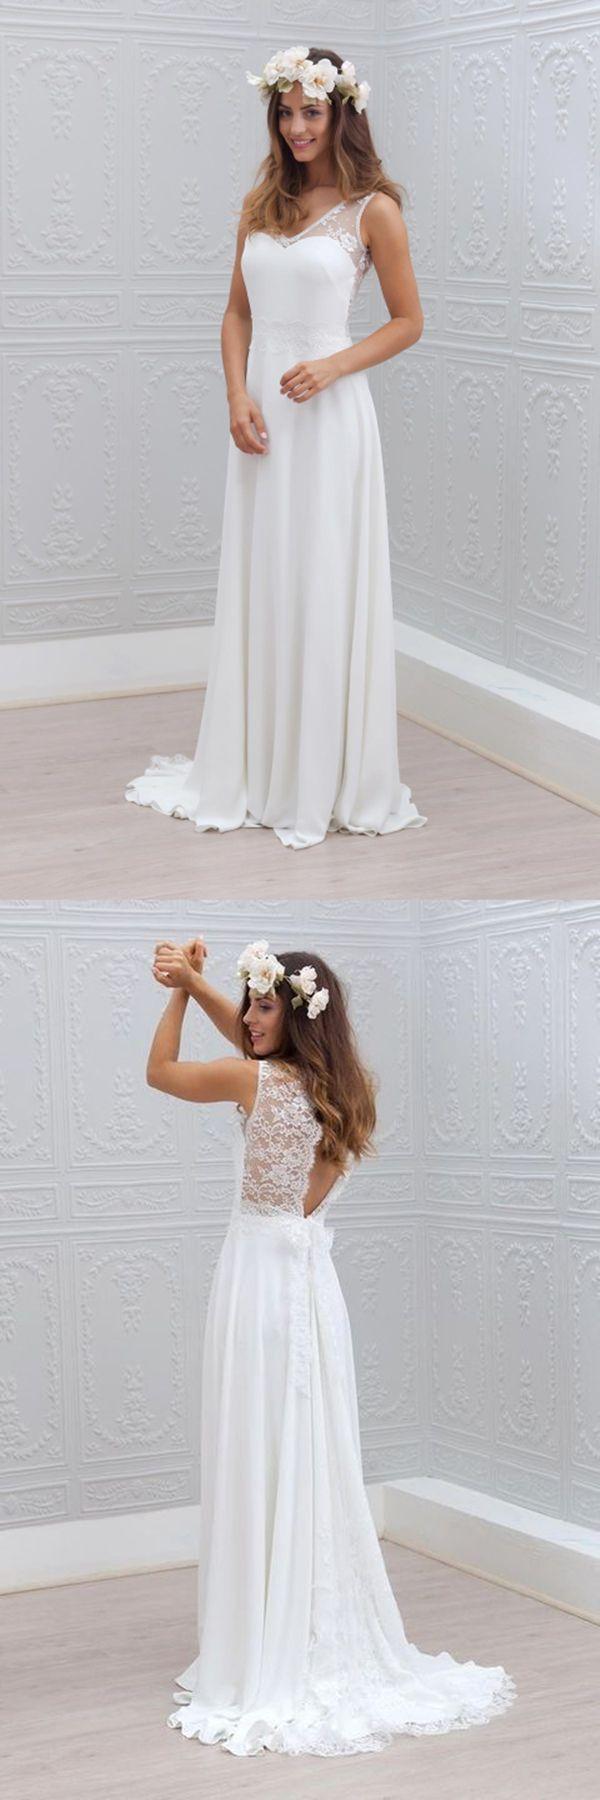 simple white wedding dresses,beach wedding dress,open back long bridal gowns,lace wedding dress cheap #weddingdress